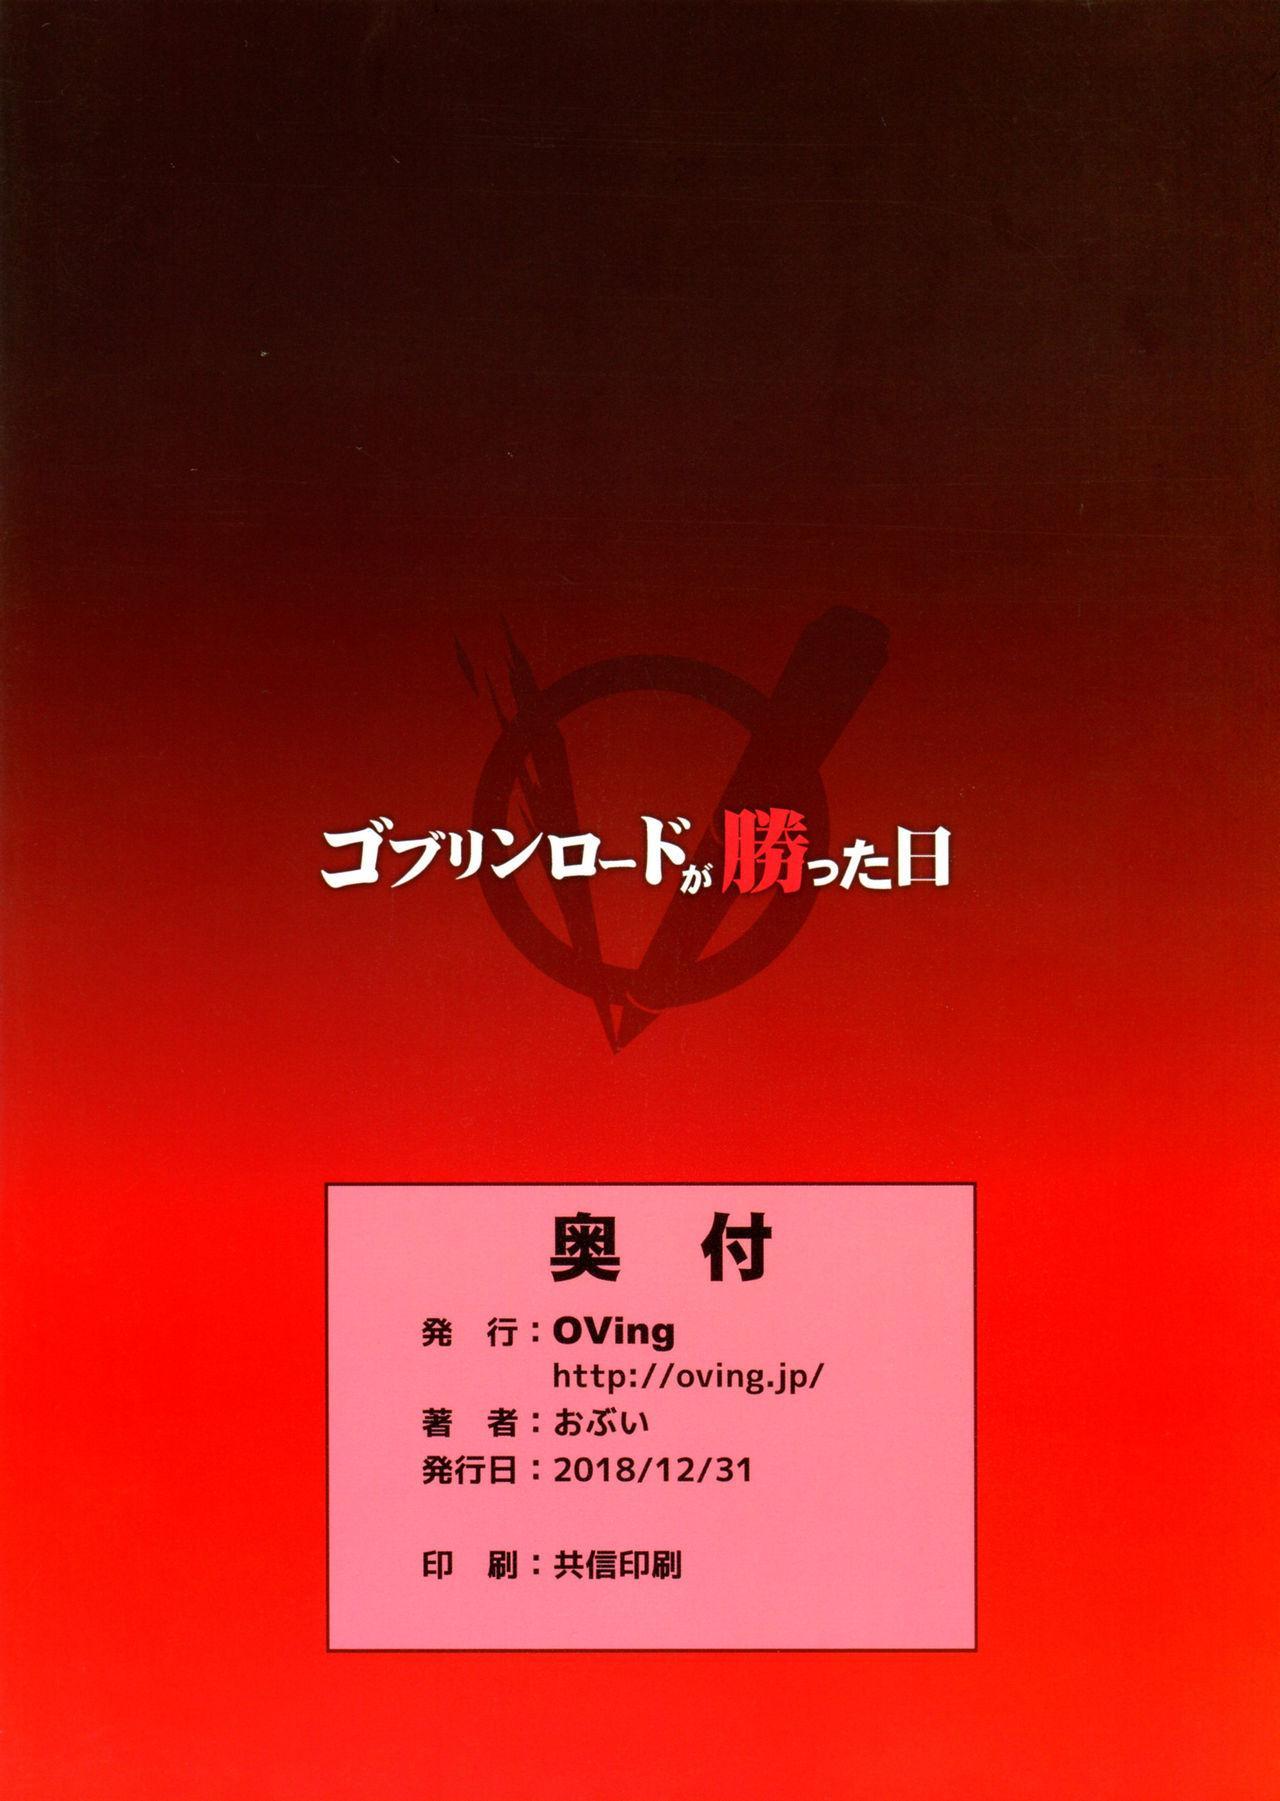 Goblin Lord ga Katta Hi + Omakebon 31